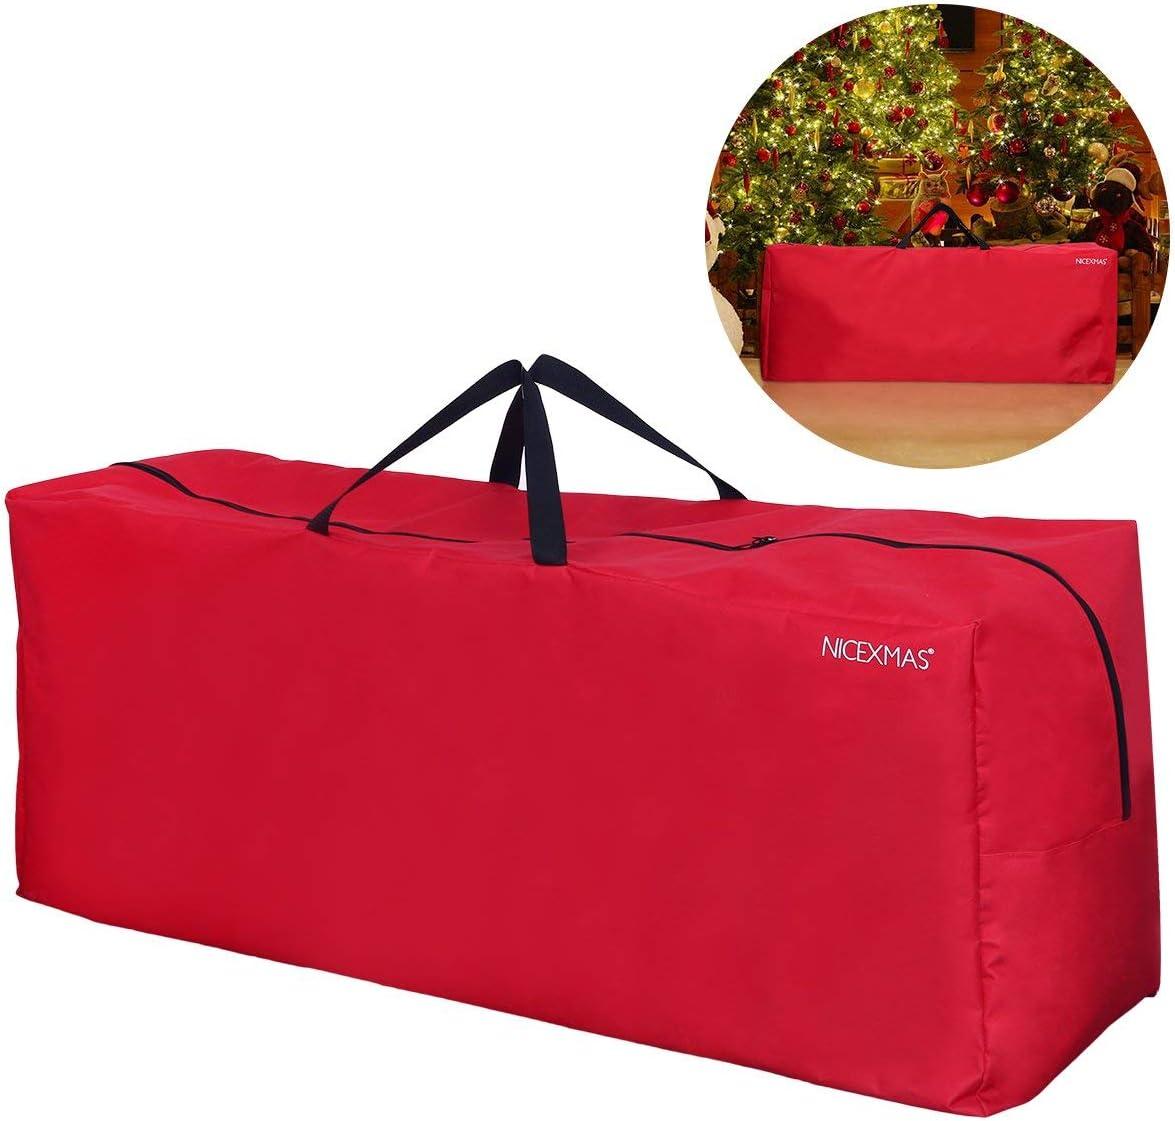 NICEXMAS Christmas Tree Storage Bag for Artificial Tree Christmas Decoration with Handles (Red) (135cm x 38cm x 54cm)